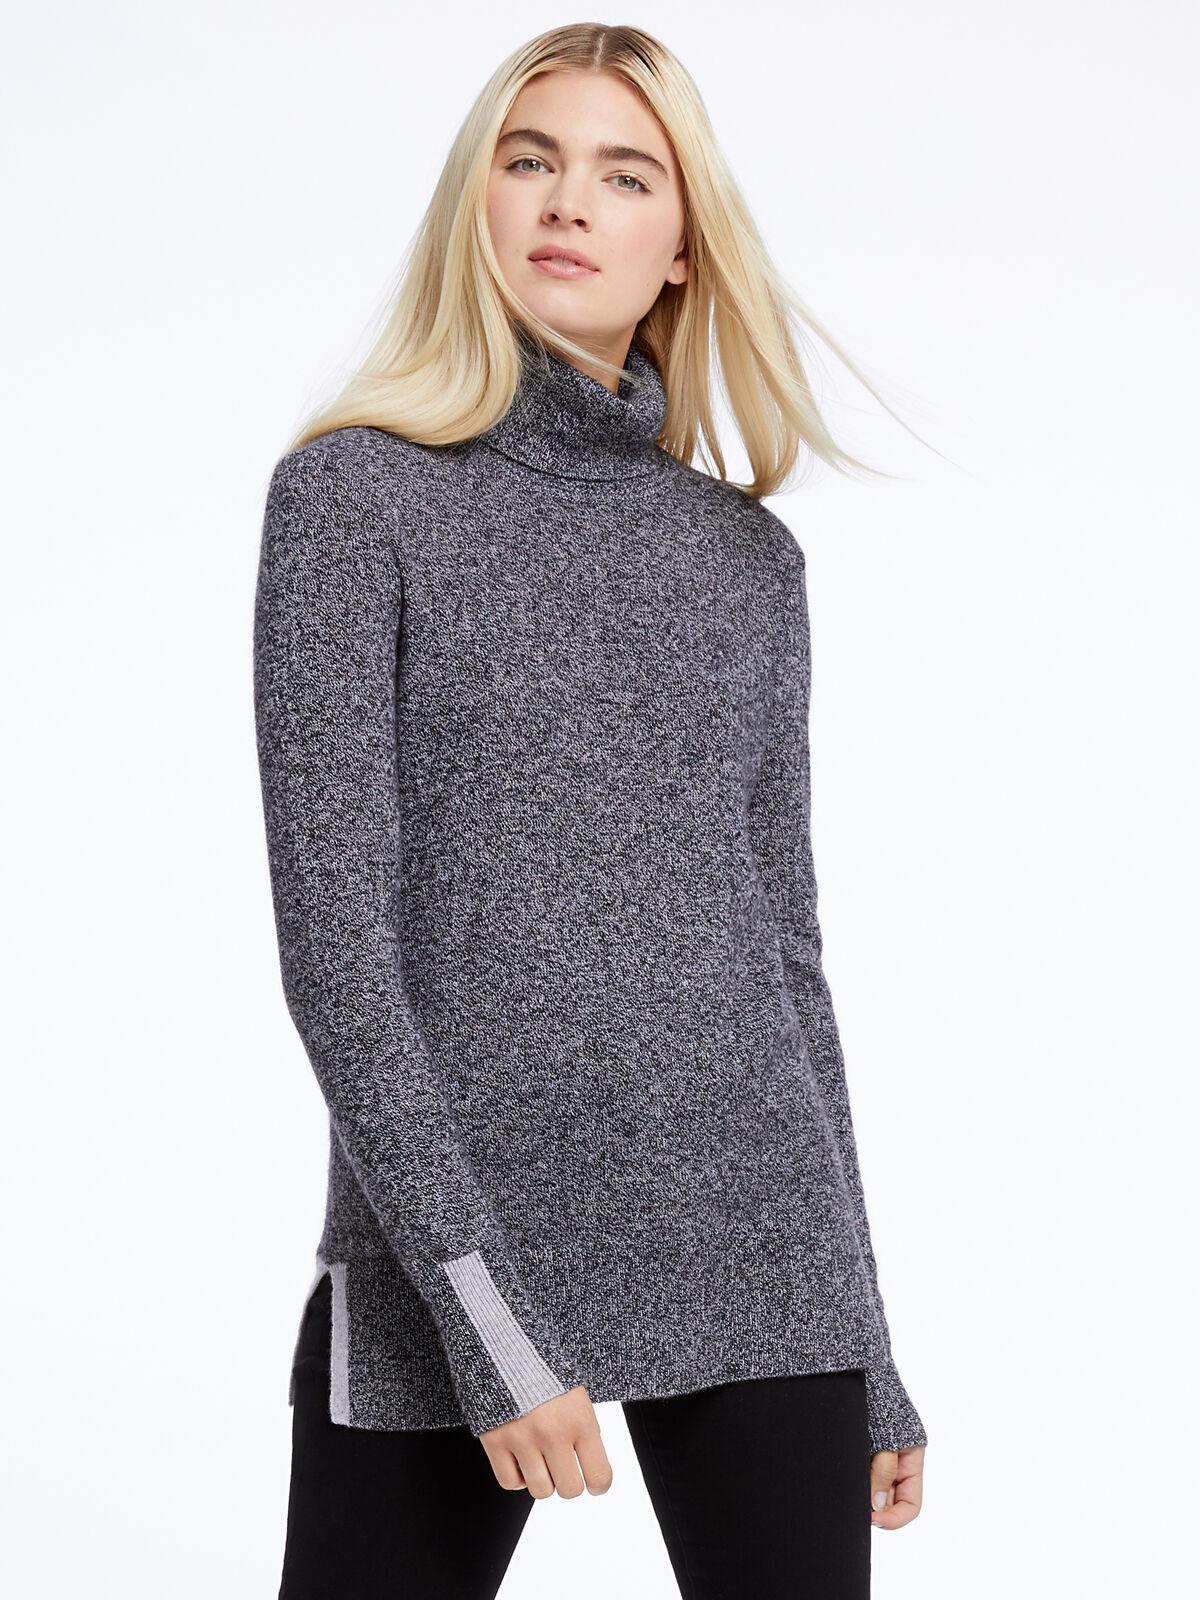 Indulge Cashmere Sweater